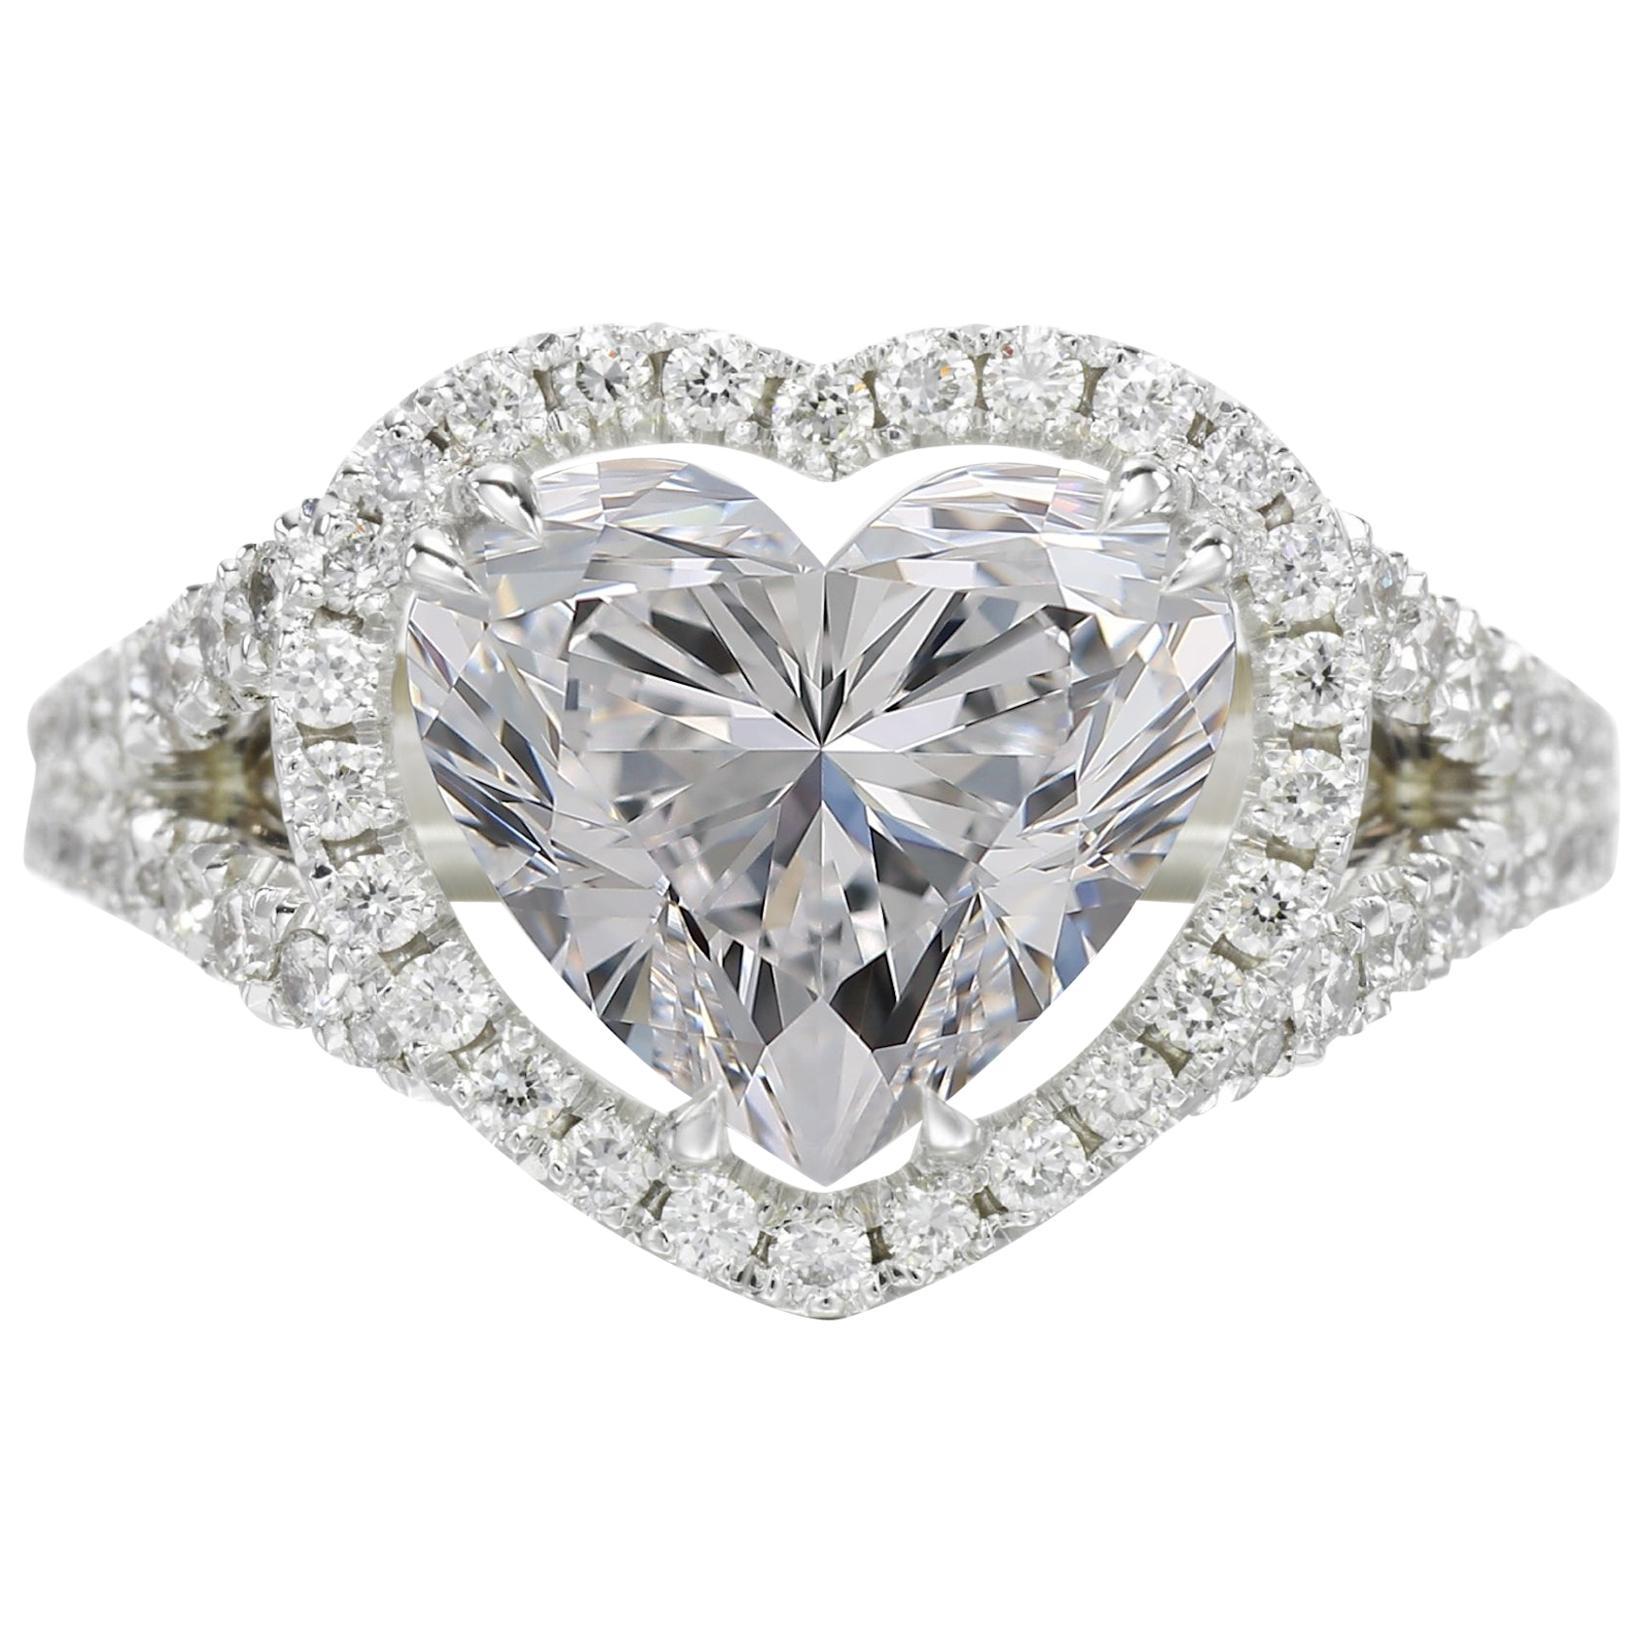 GIA Certified 3.01 Carat Heart Shape Cut Diamond D IF